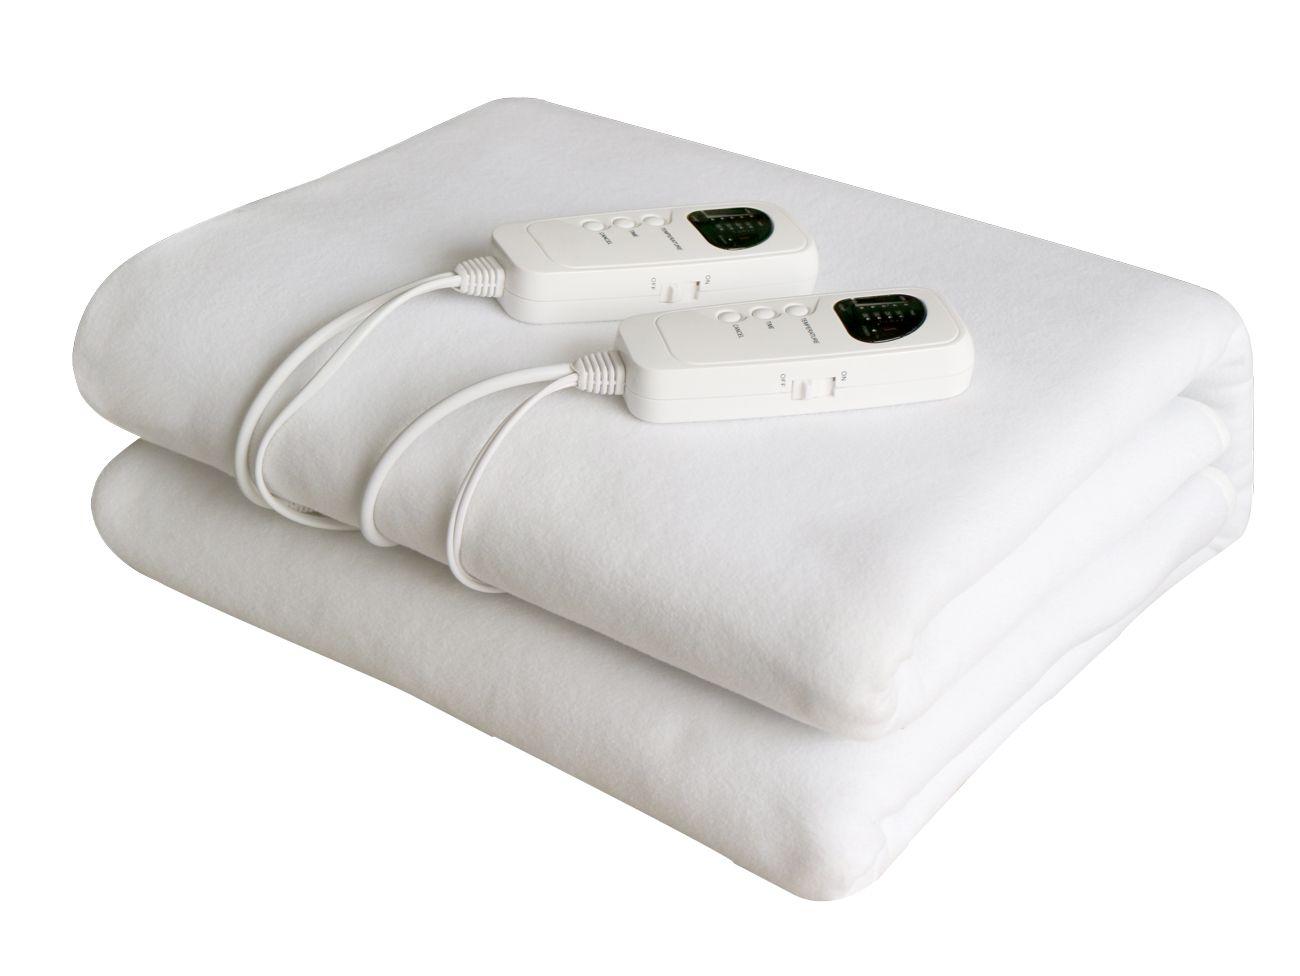 Lençol Térmico Cobertor Elétrico Kenko Casal 140x190cm Luxo Multi Temperaturas   - Kenko Premium Colchões